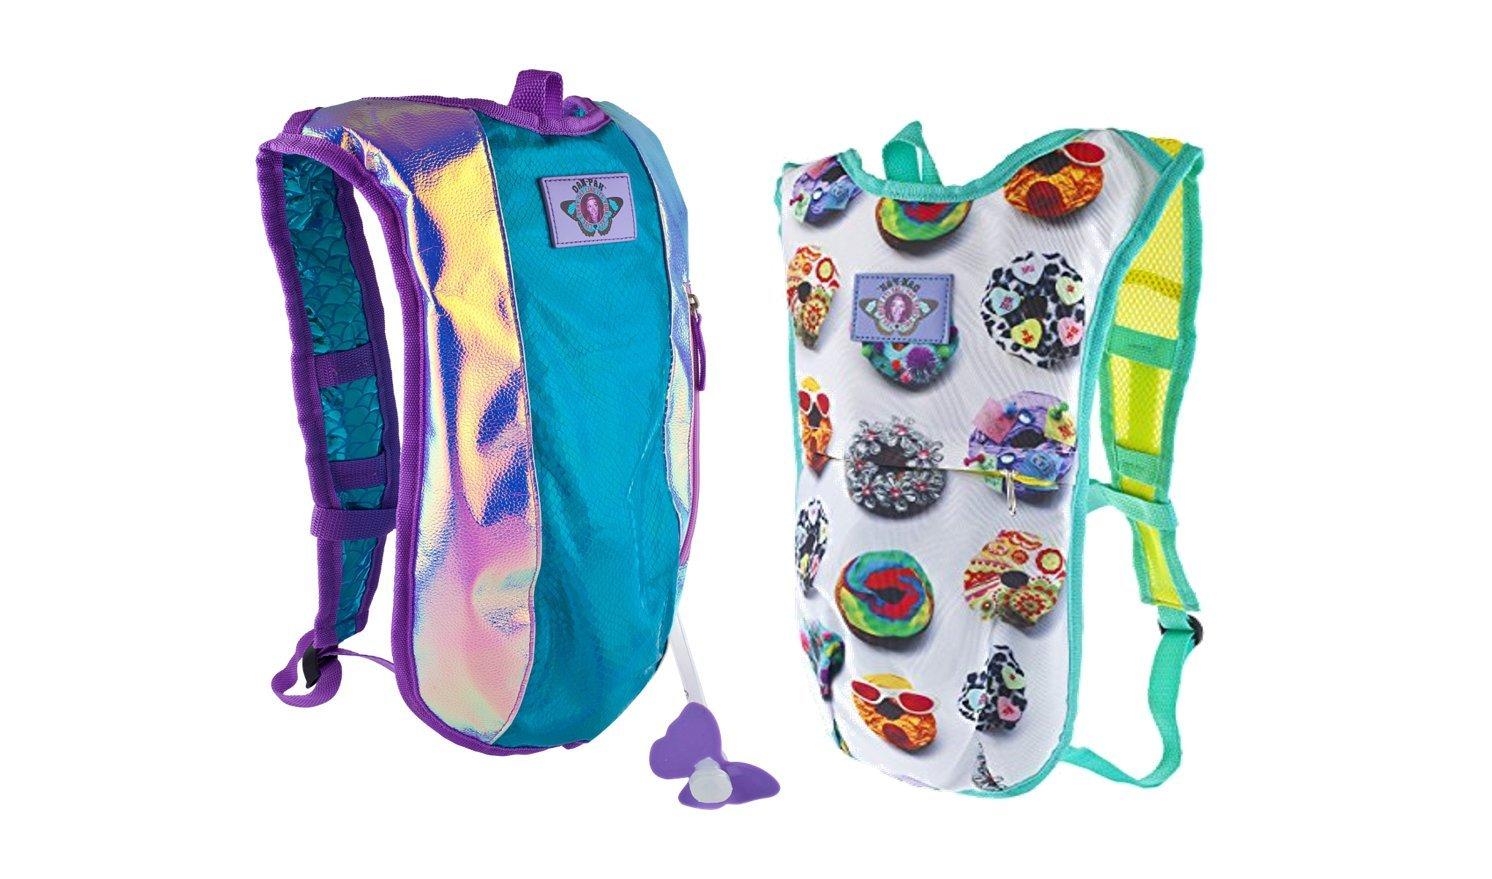 Dan-Pak Hydration Mermaid and Donut 2 Pack!- Plurmaid and Donut Love Combo paclk-Mermaid Scales Rave Backpack Blue and Purple Shiny Bag plus Donut printed bag